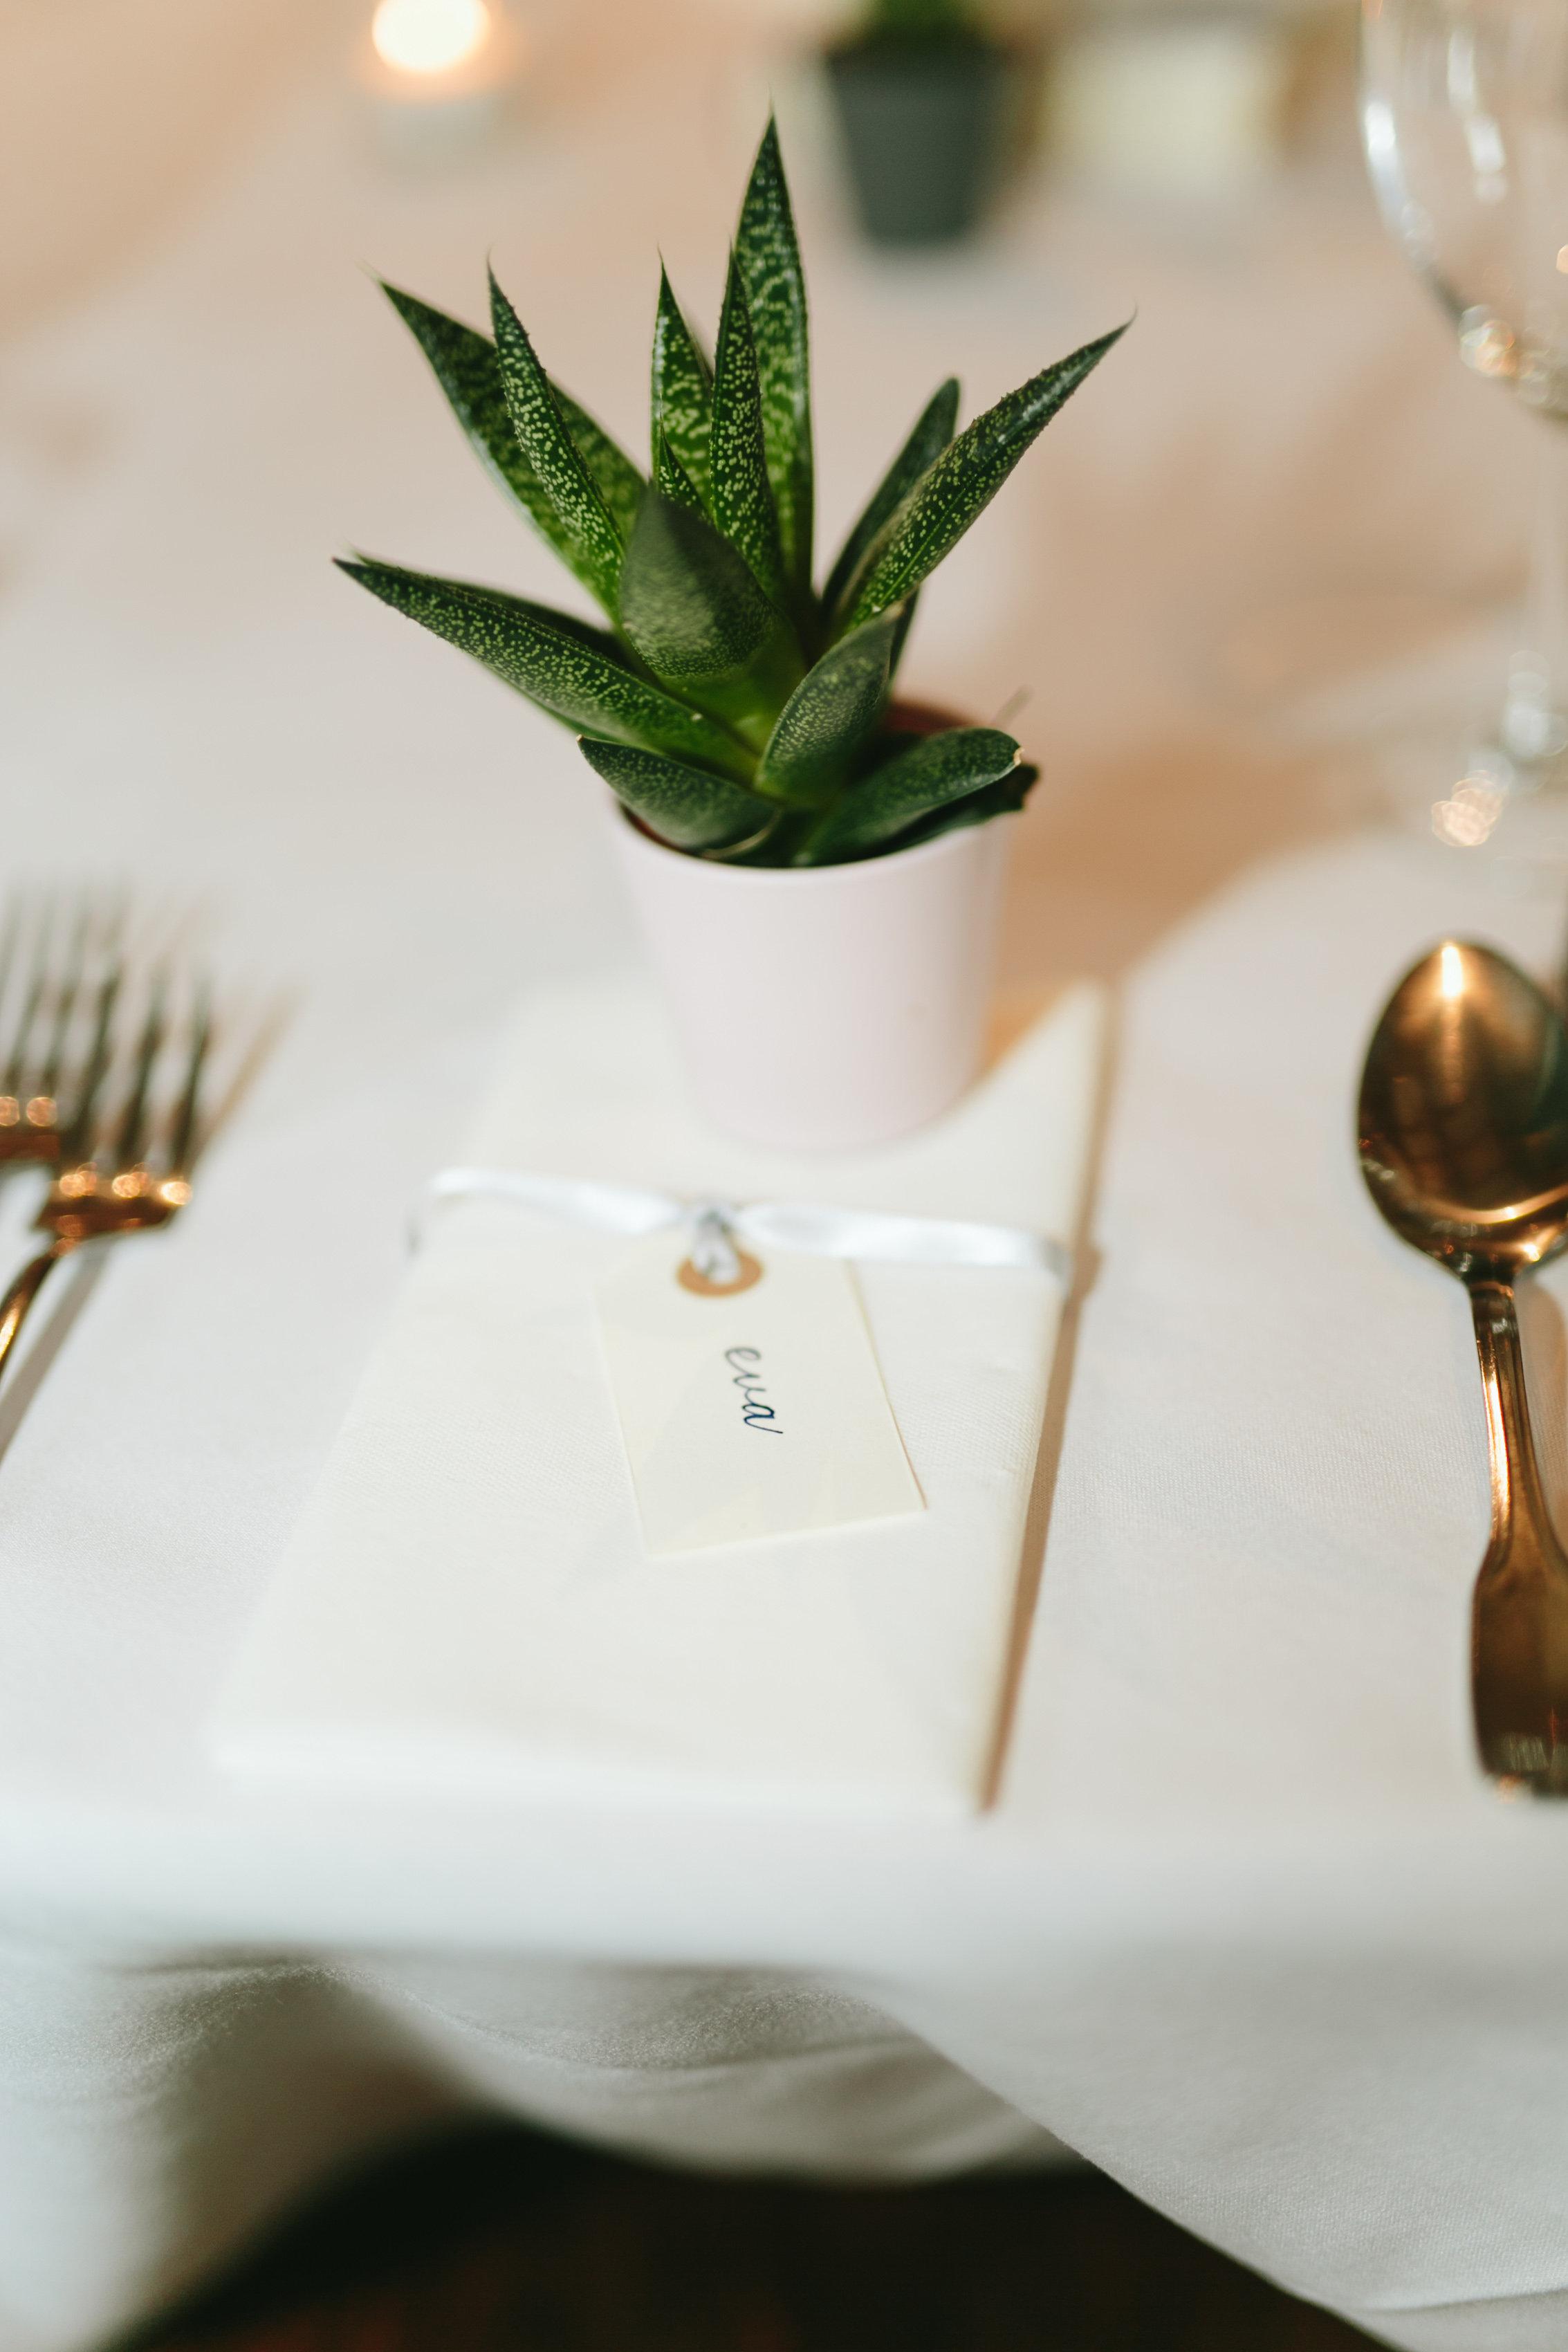 Wedding Decor - Place Cards